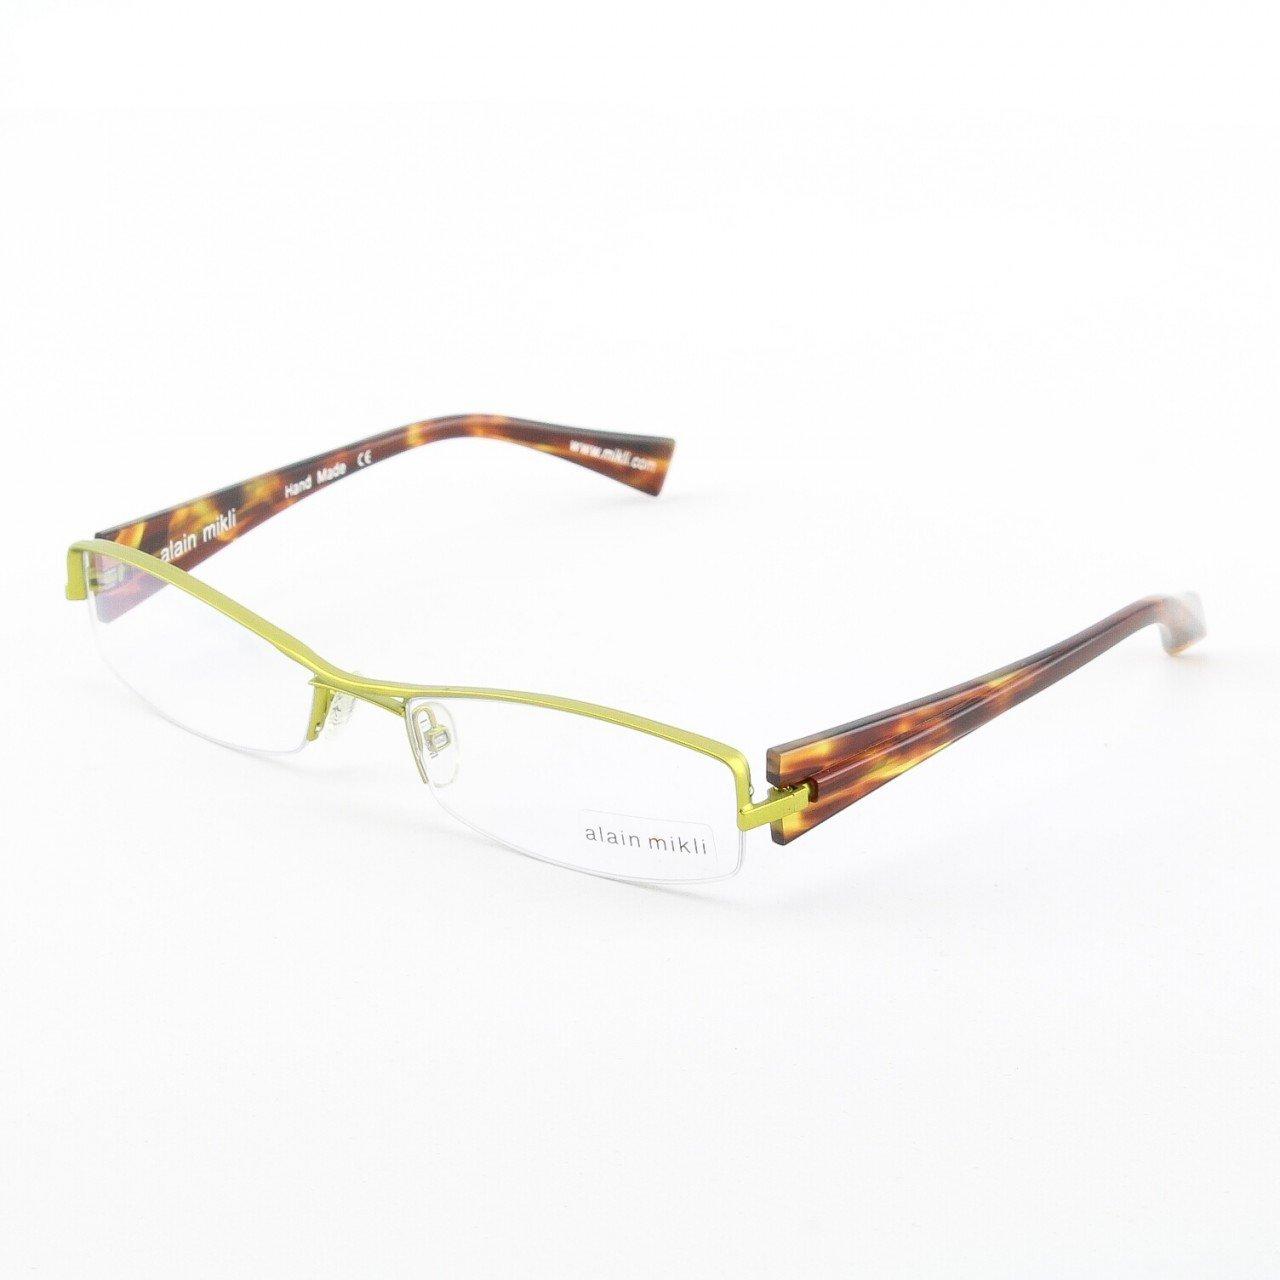 Alain Mikli Eyeglasses AL0656 Col. 17 Burnished Brass Metallic Frame with Amber Temples